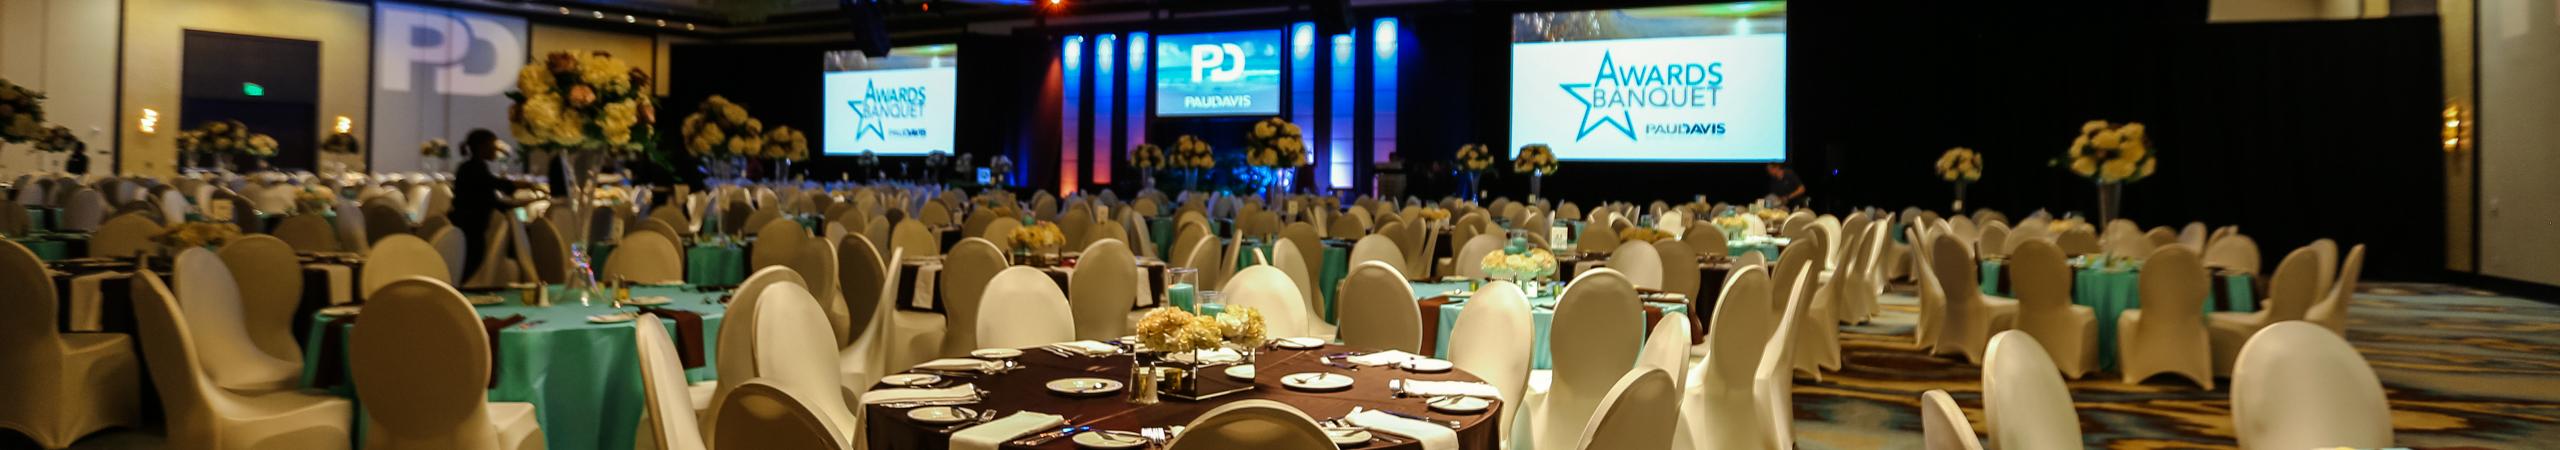 Magnolia Ballroom Awards Banquet